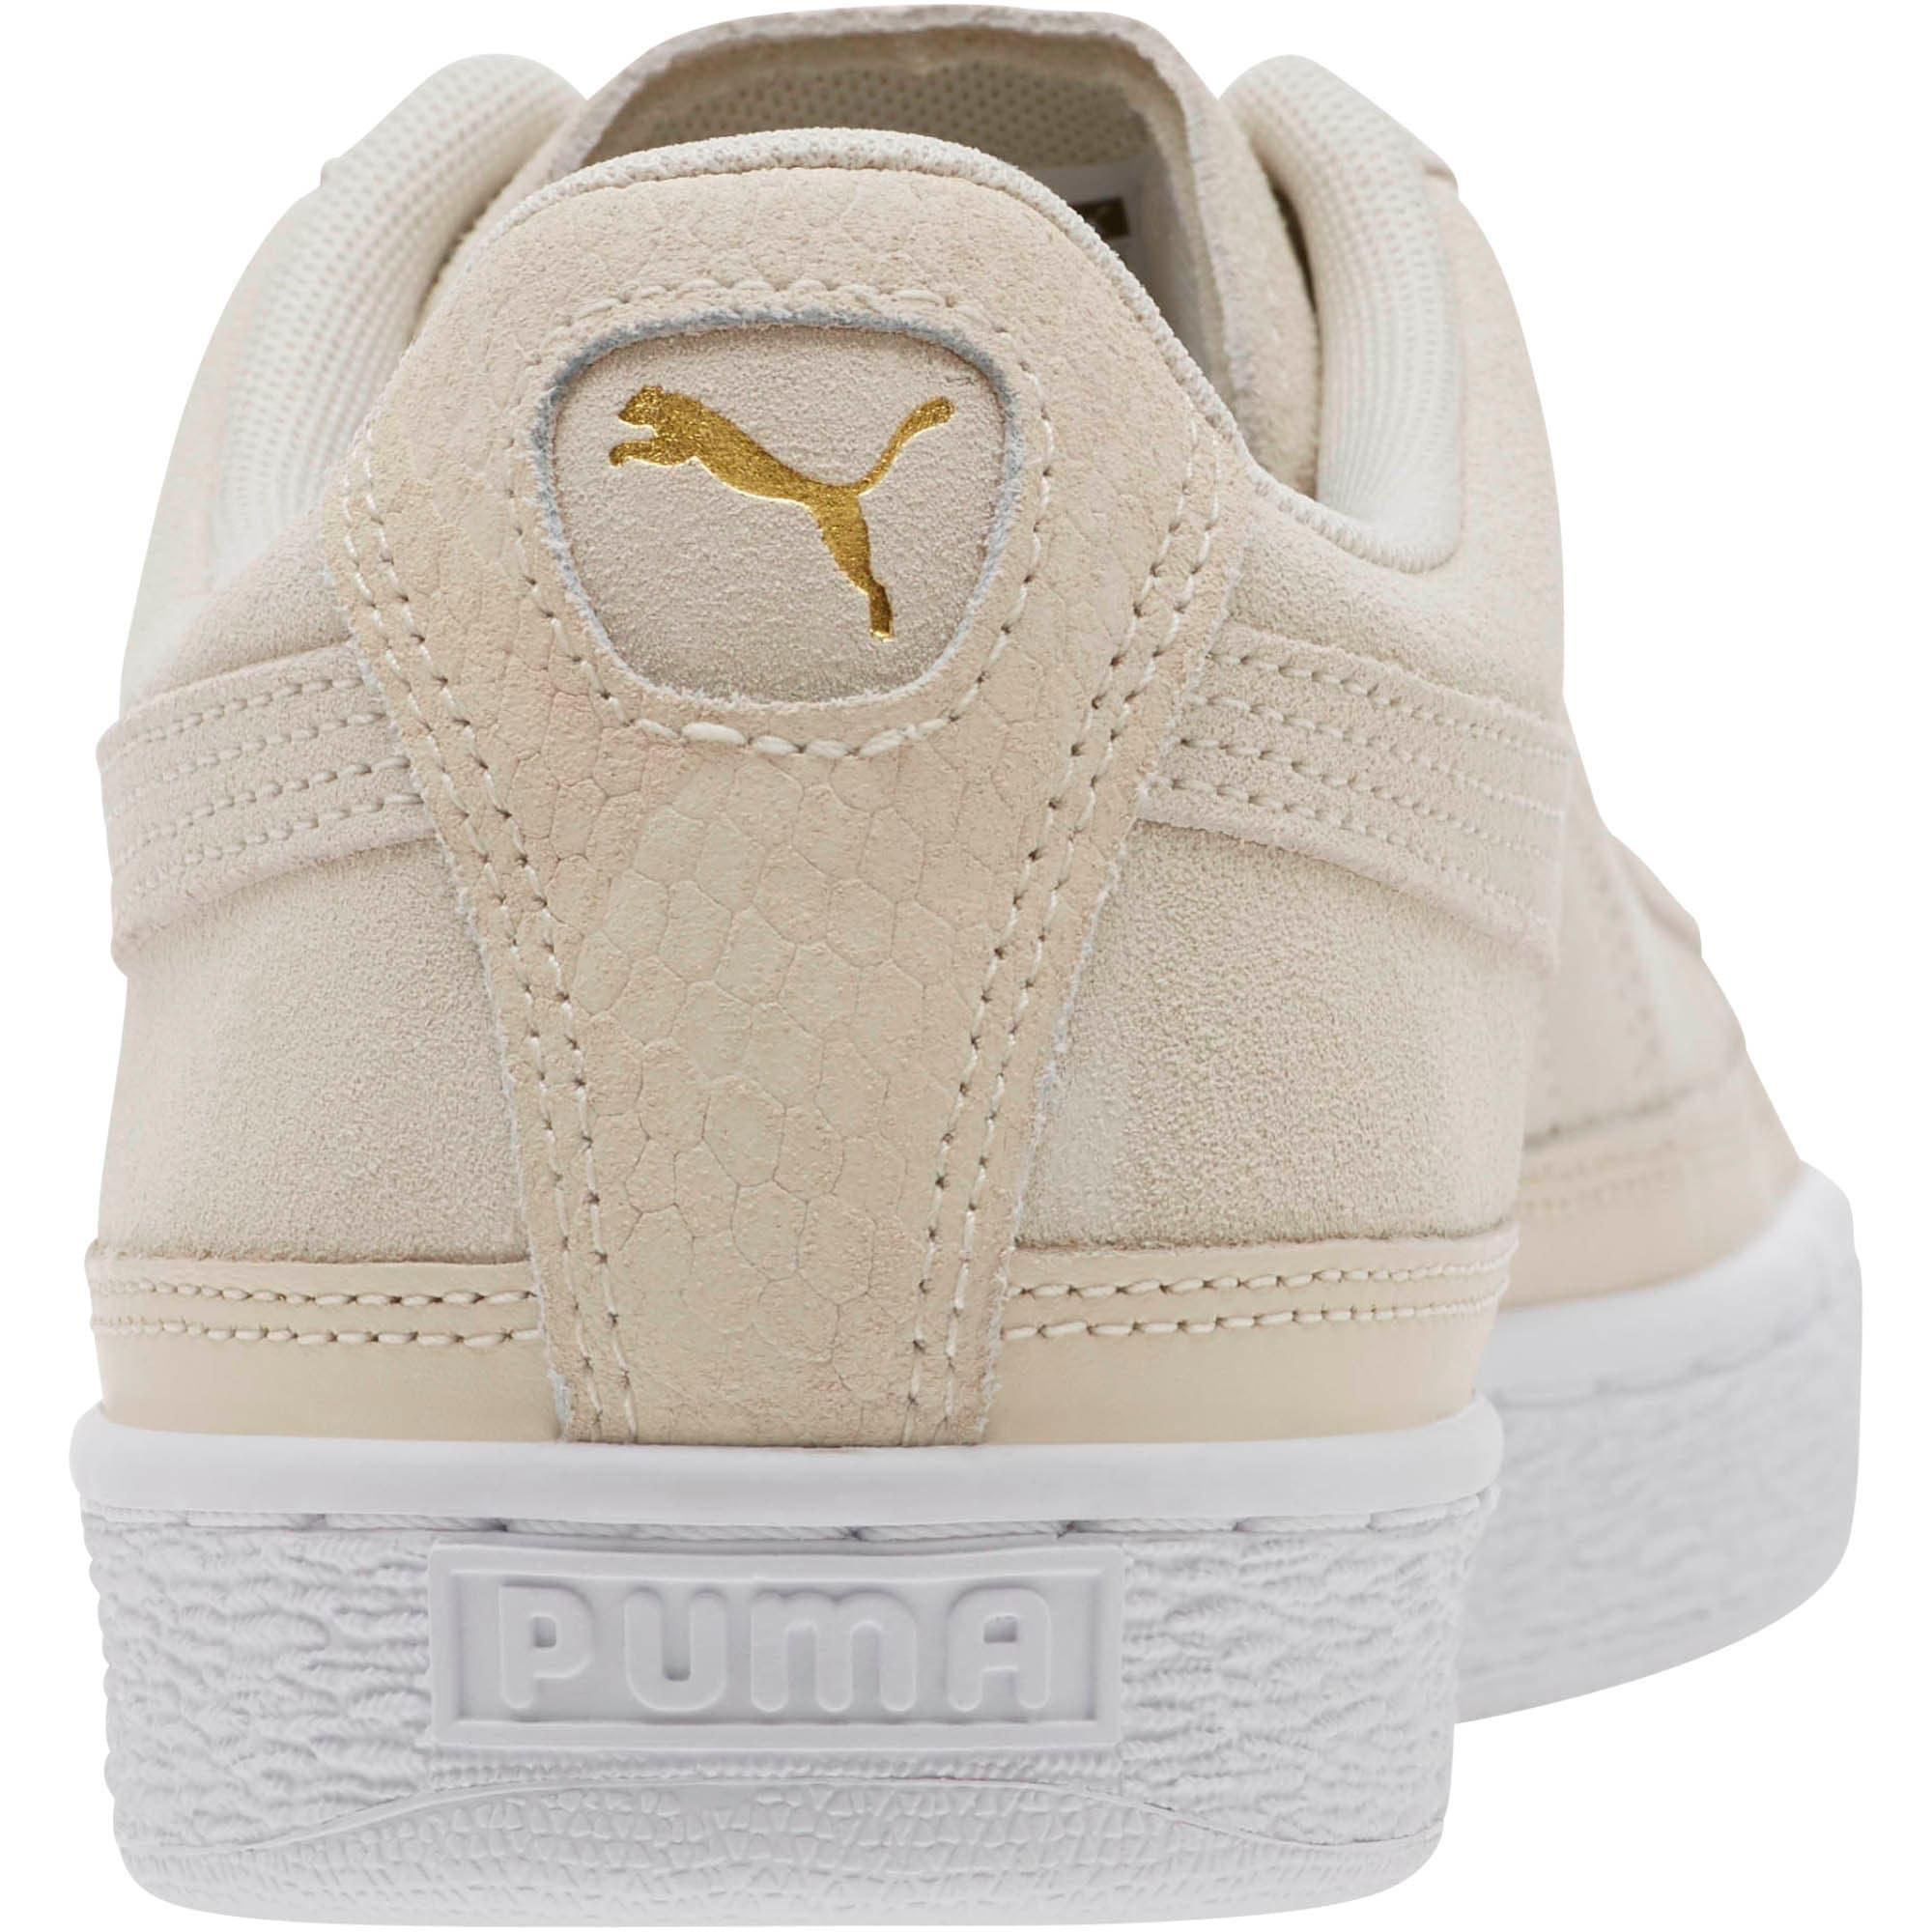 Thumbnail 4 of Suede Skate Premium Sneakers, Whisper White-Puma White, medium